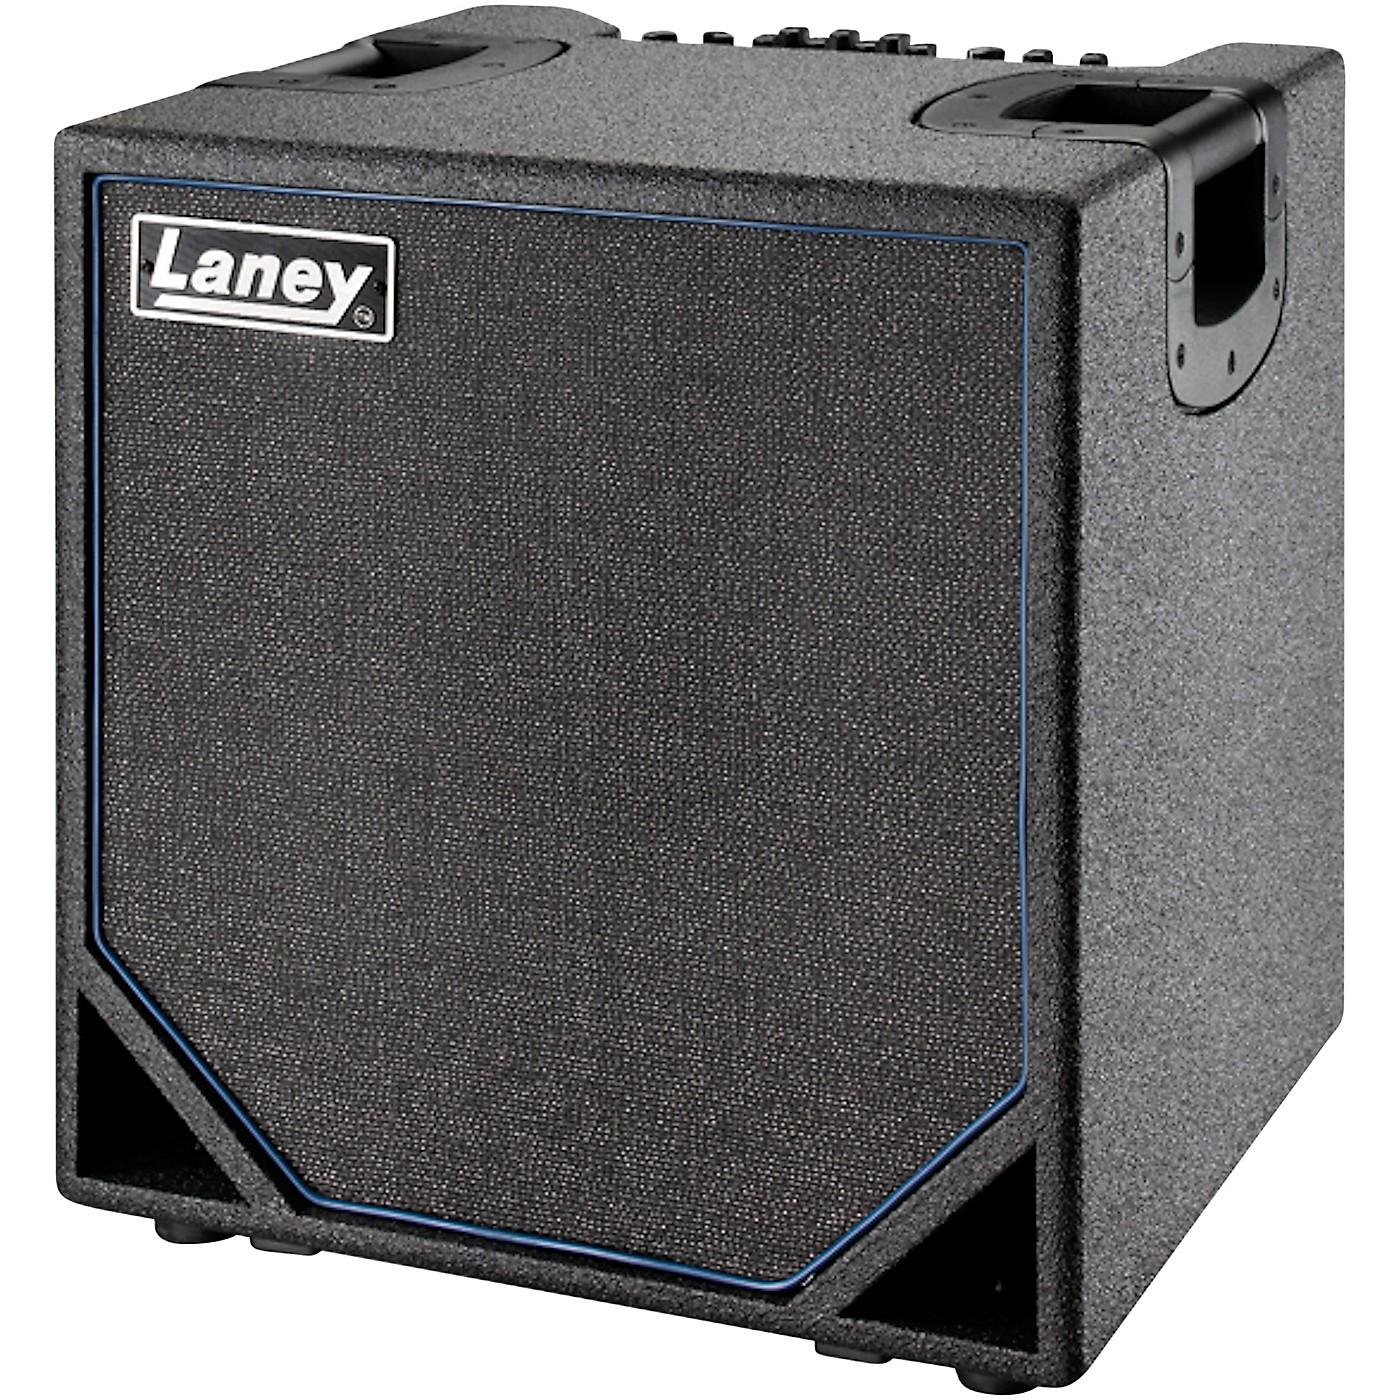 Laney Nexus SLS-112 500W 1x12 Bass Combo Amp thumbnail